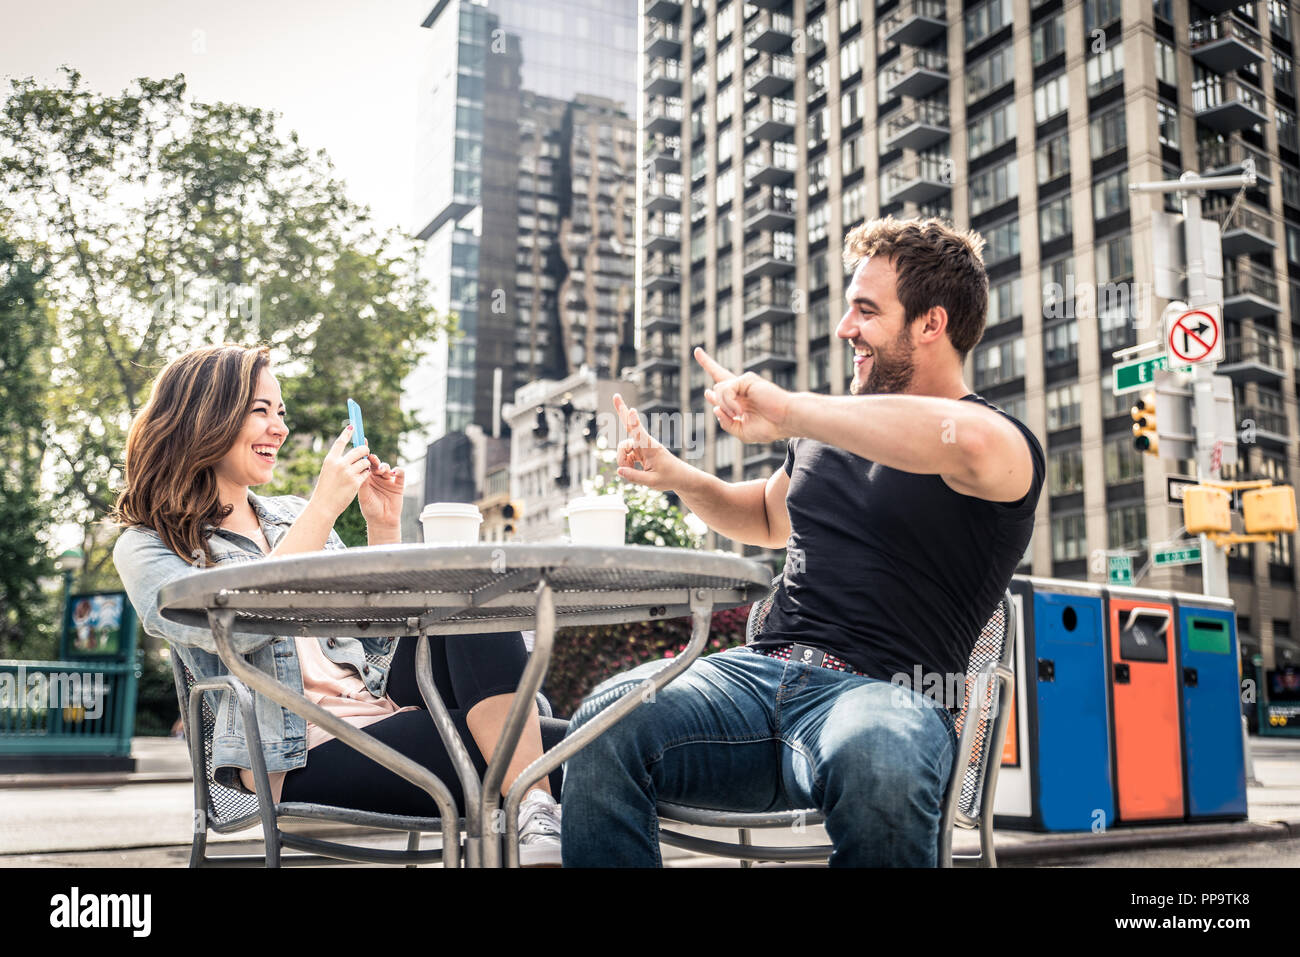 Manhattan dating